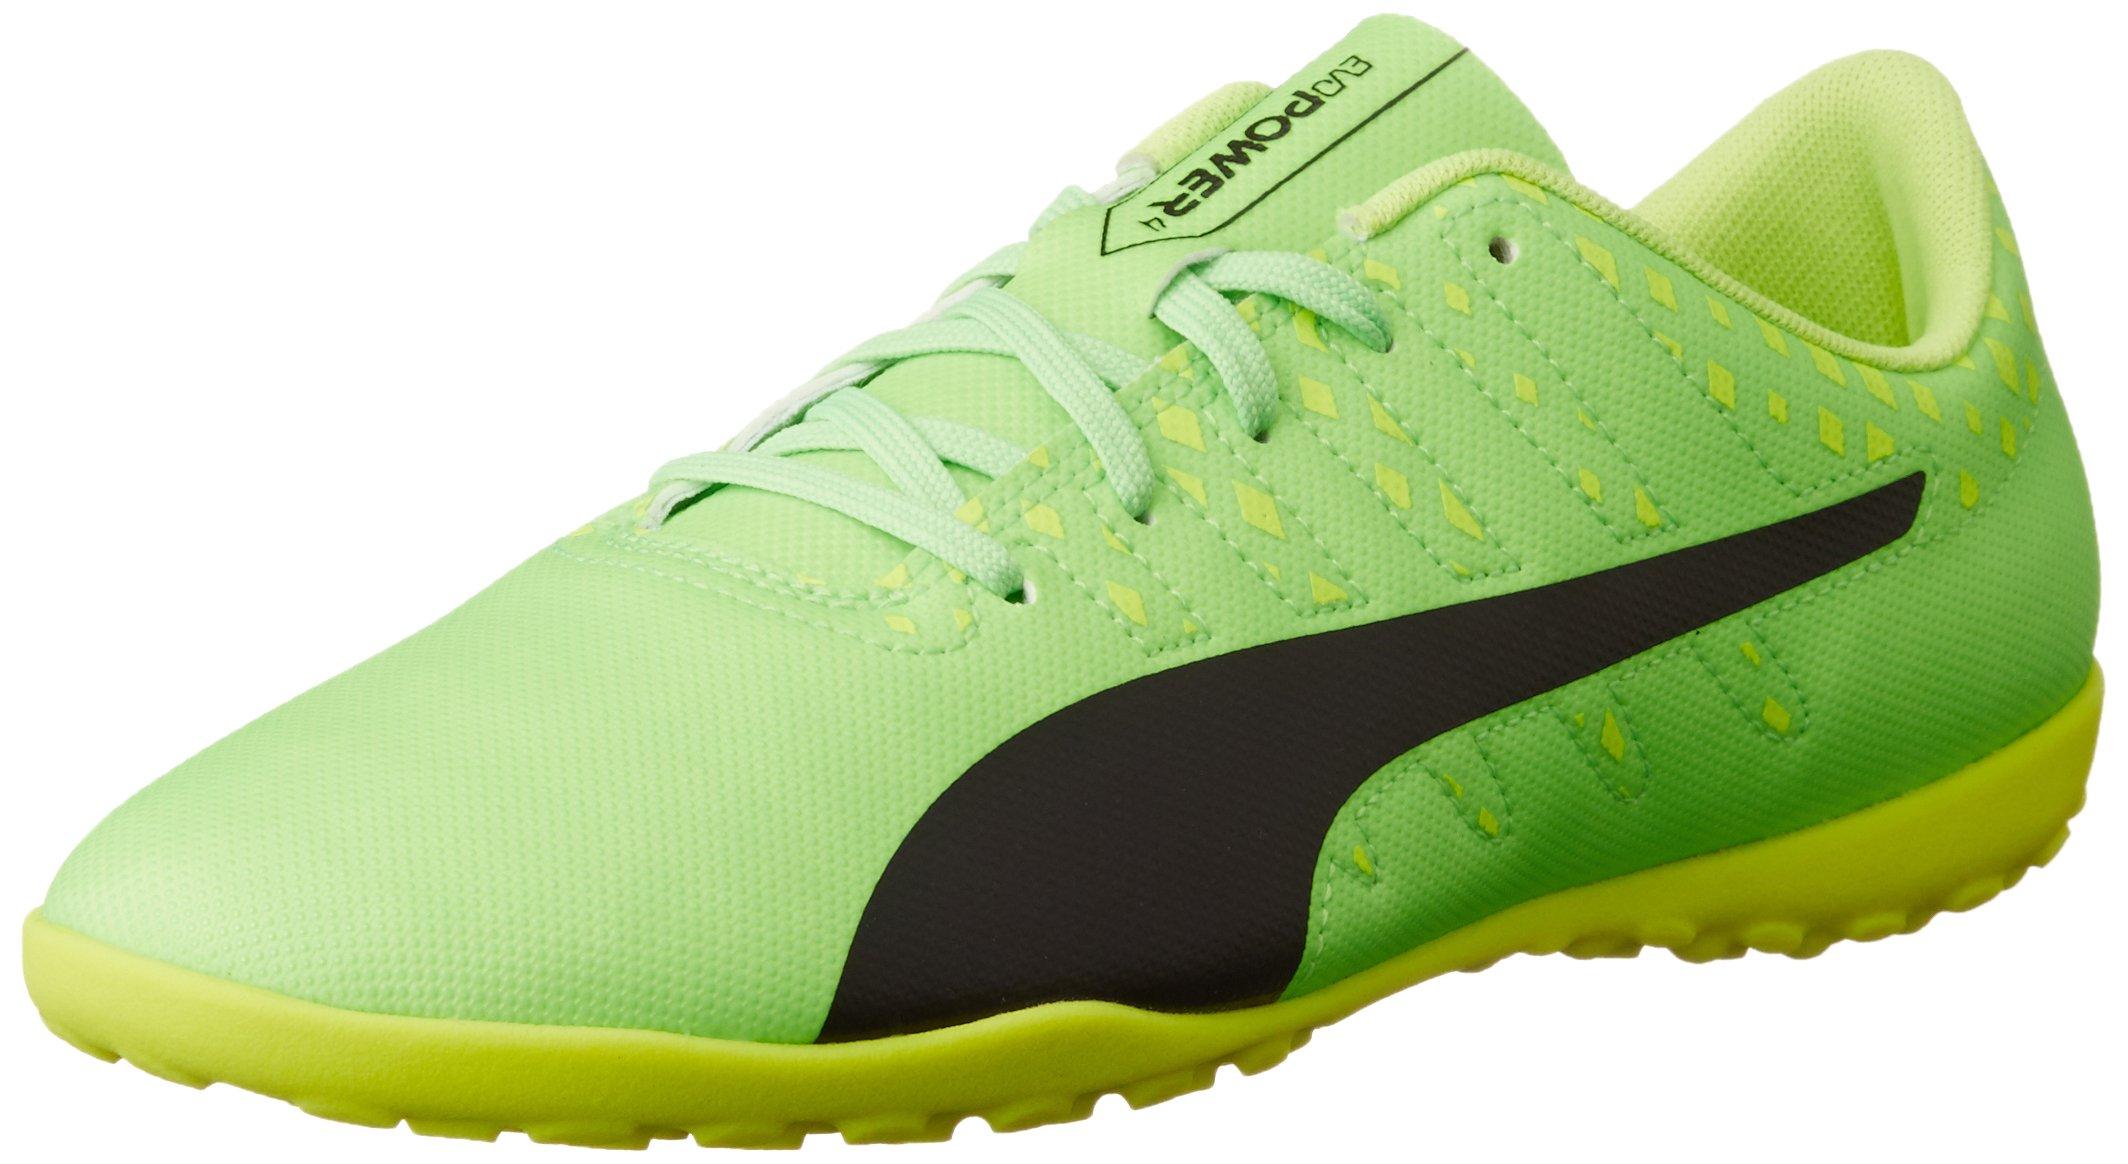 PUMA Boys Trainers PU10397401 Green/Black/Yellow UK 6/US 7